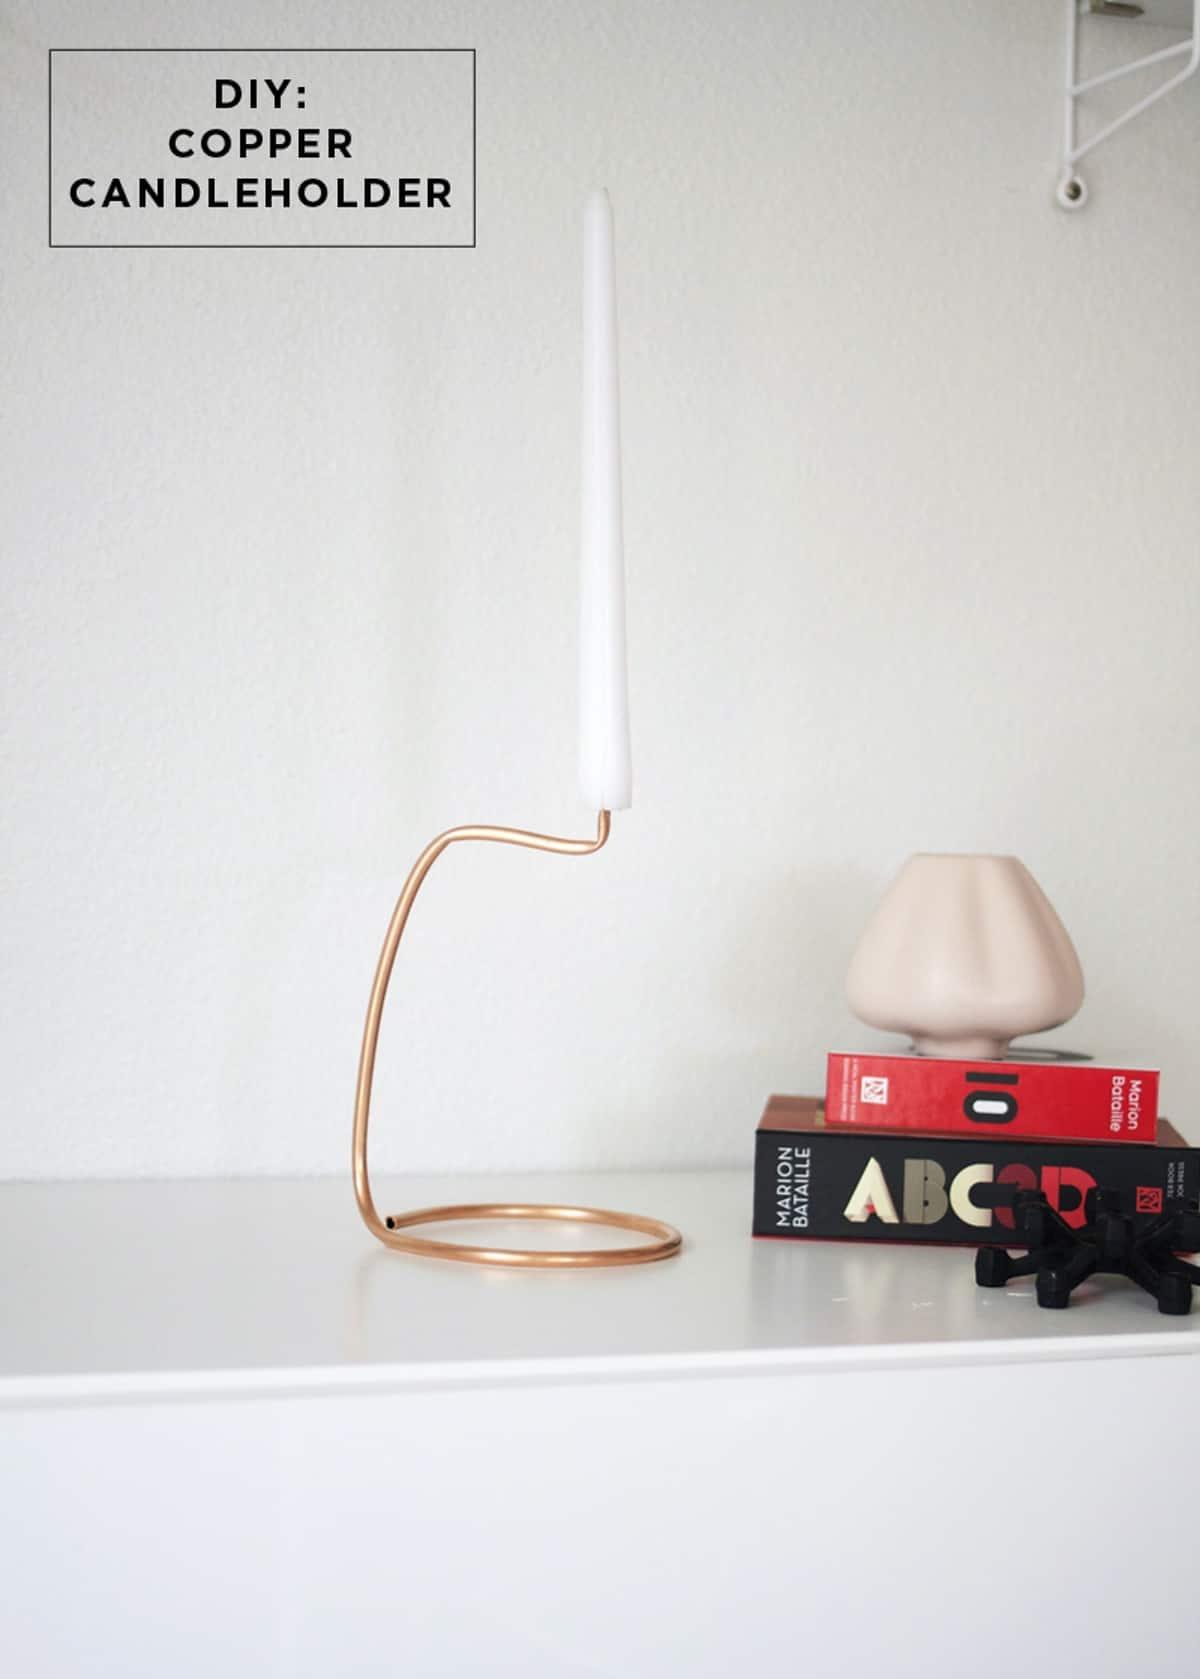 The Futuristic Copper Candle Holder